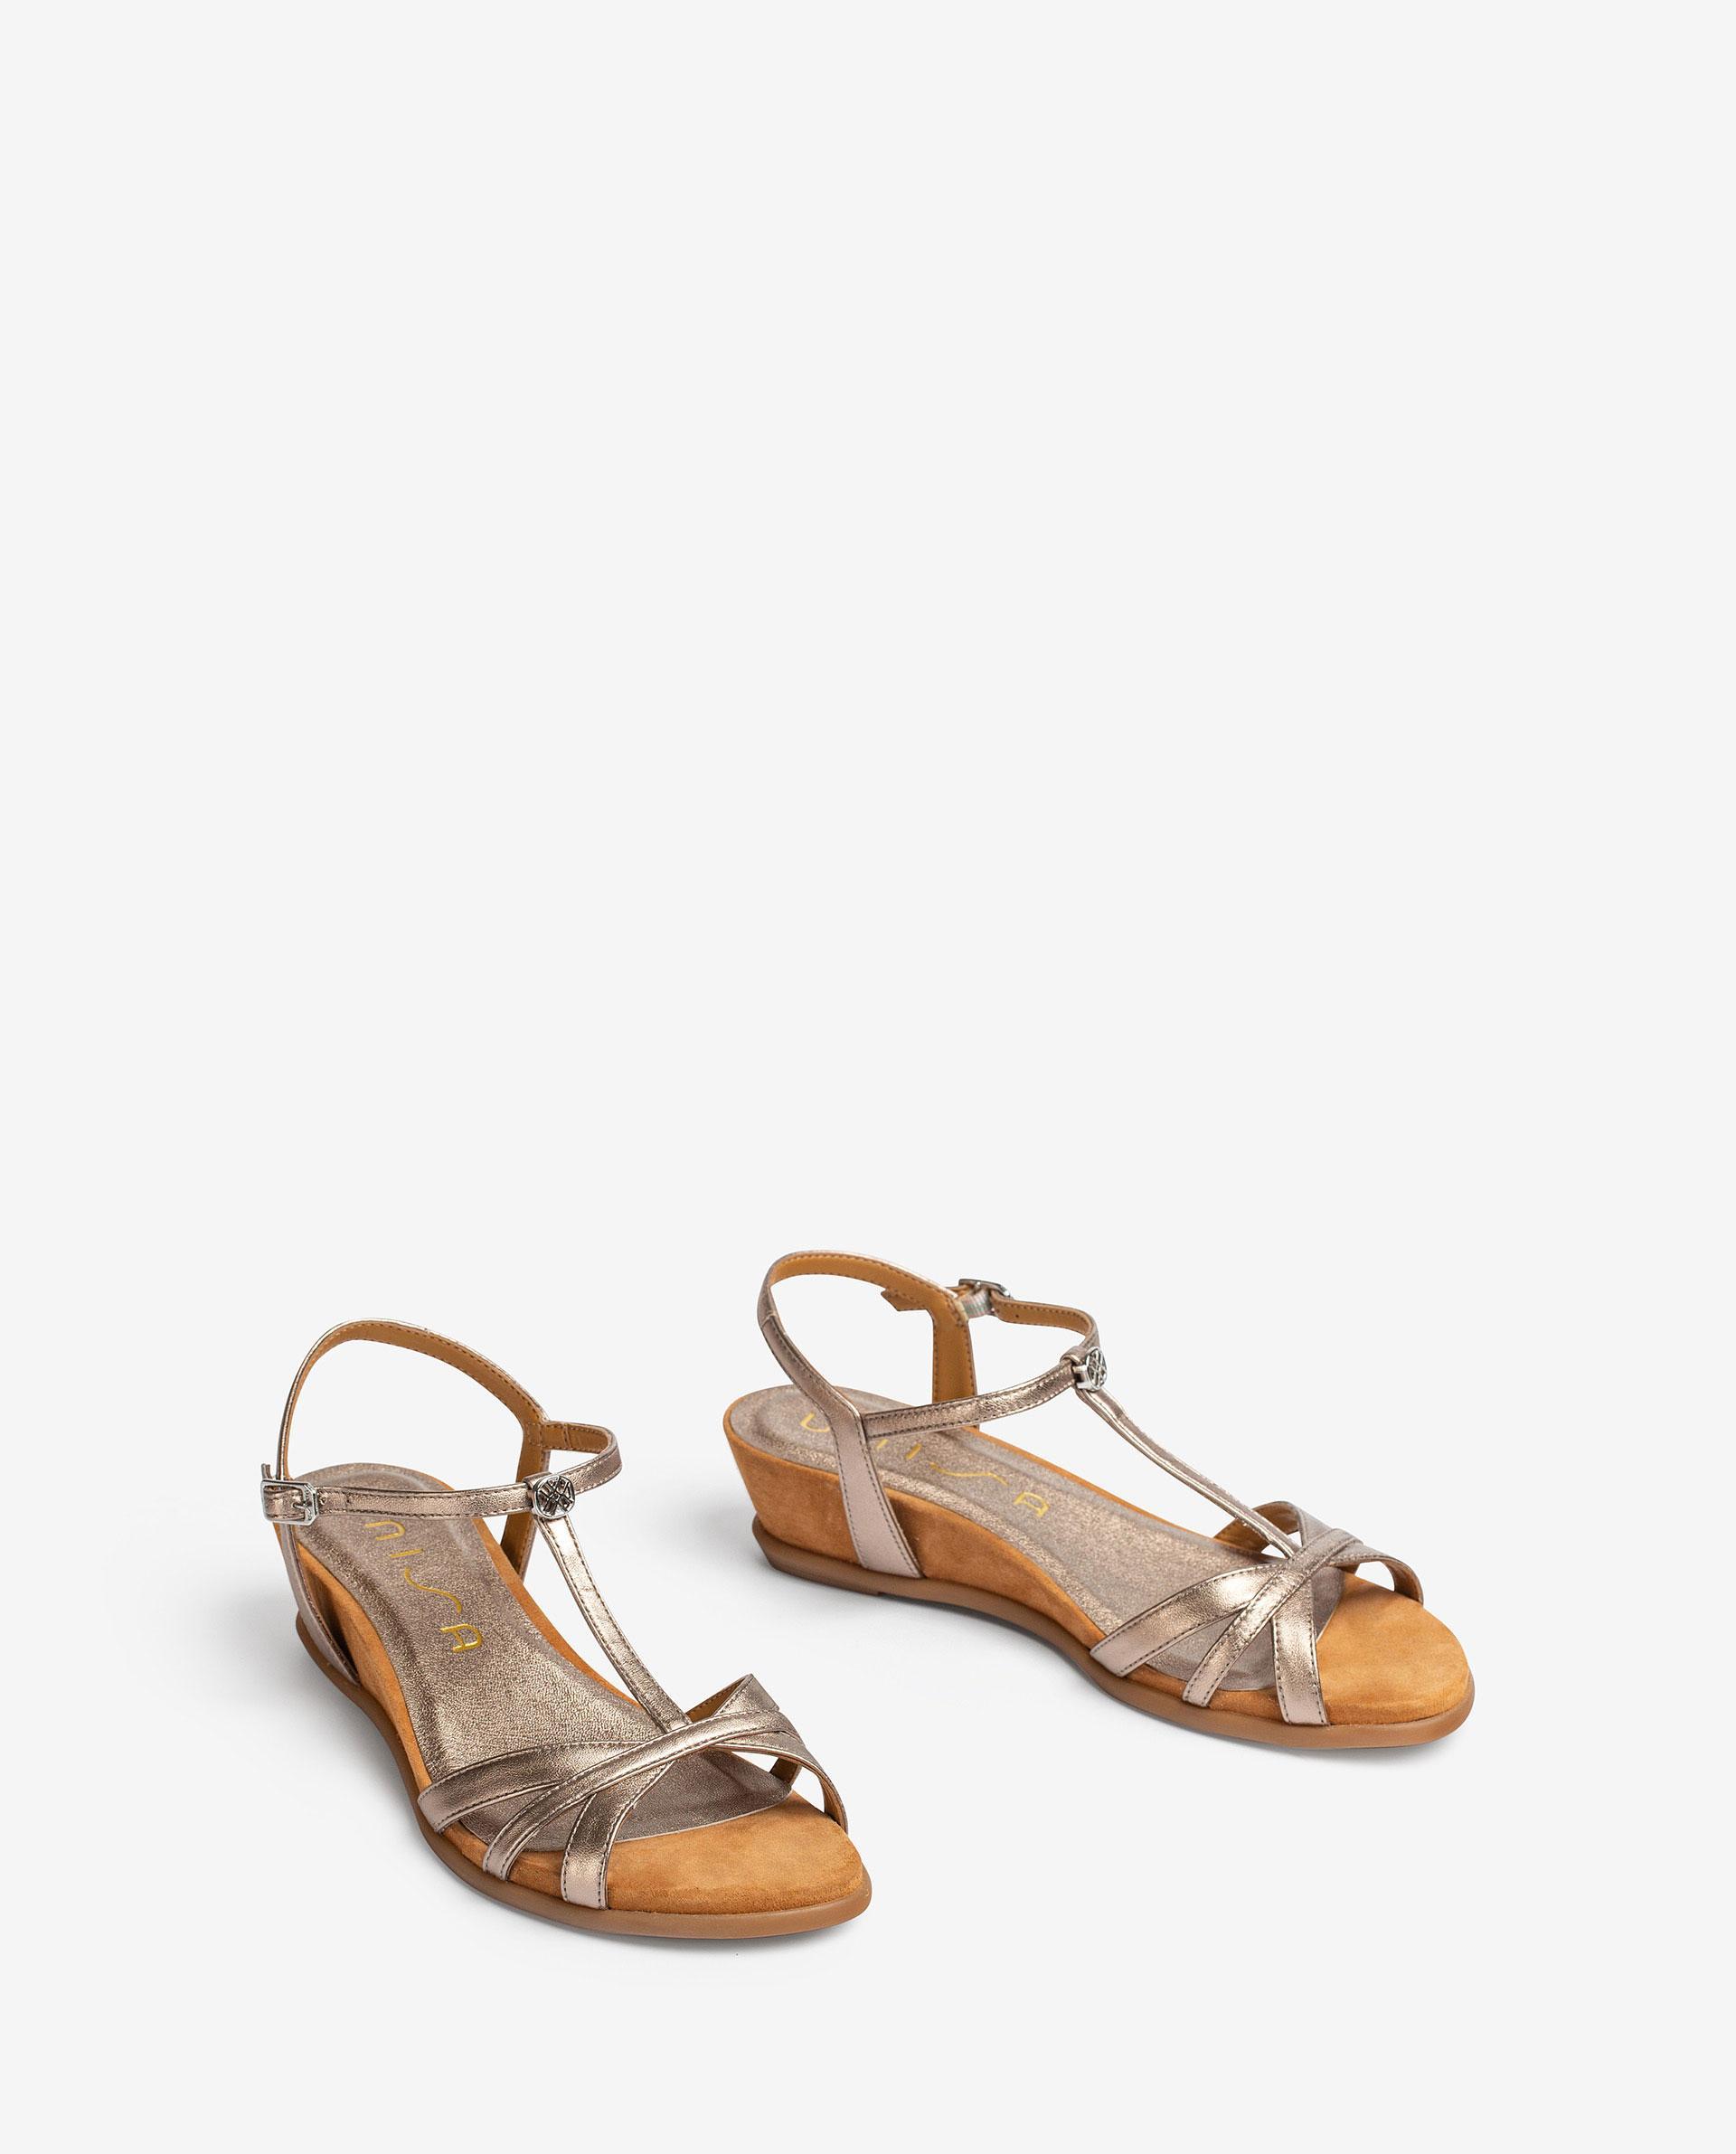 Unisa Sandals BINAR_21_LMT mumm